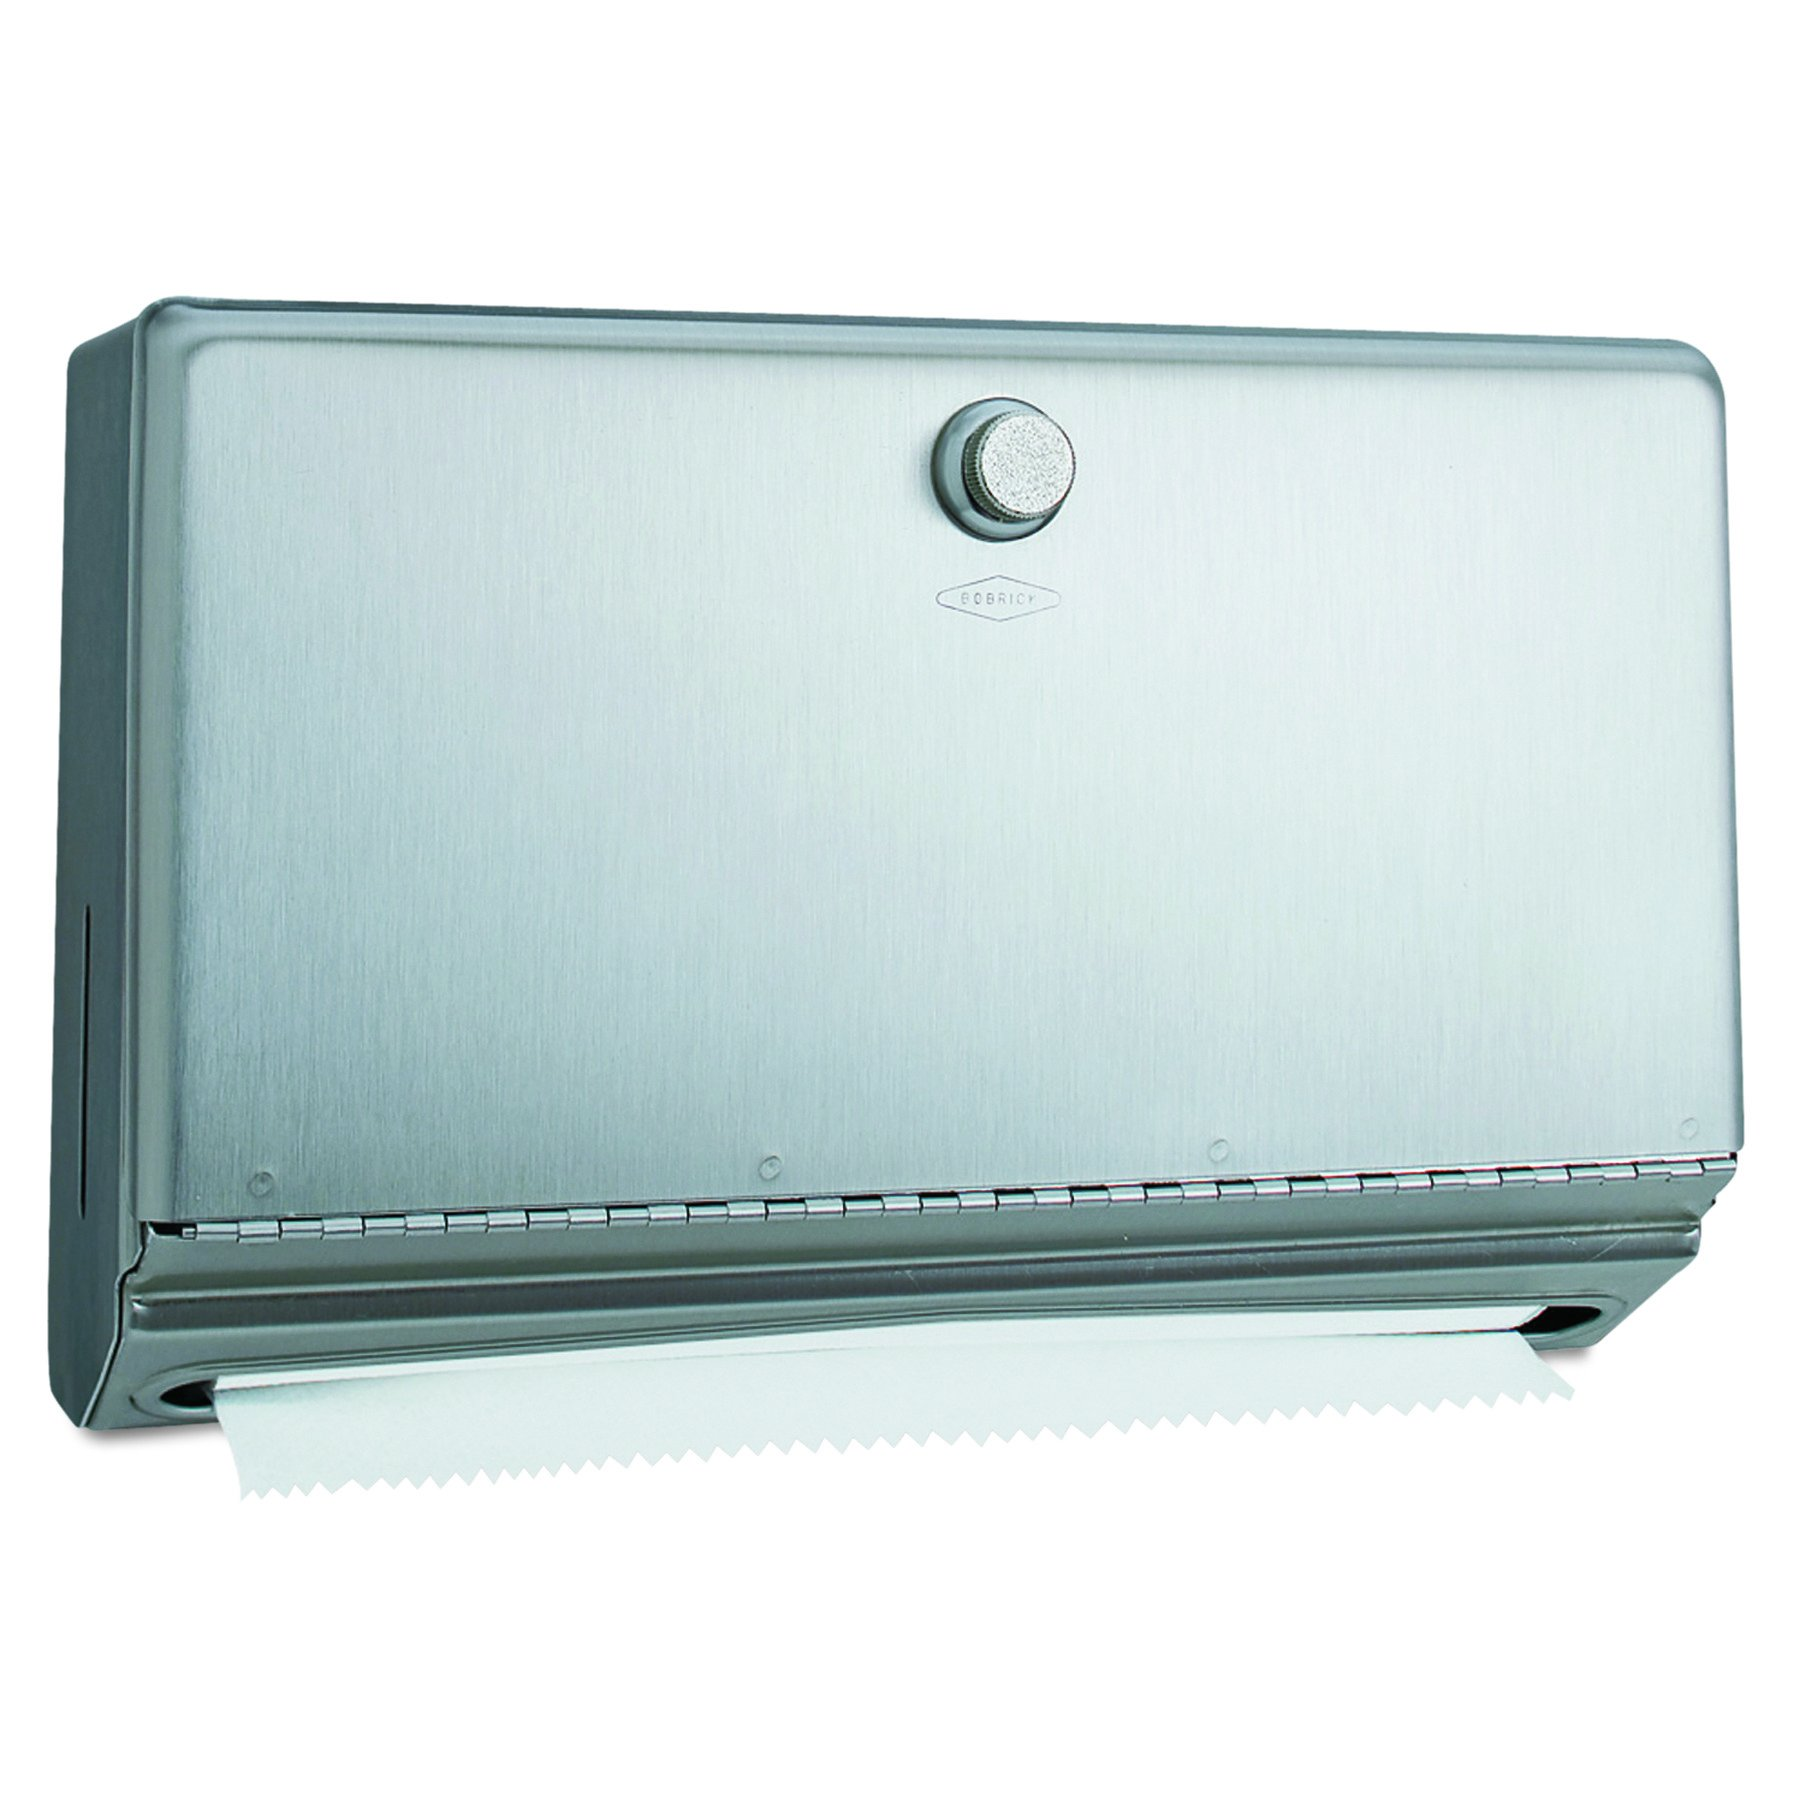 Bobrick B-2621 Classic Series Surface-Mounted Paper Towel Dispenser, Satin